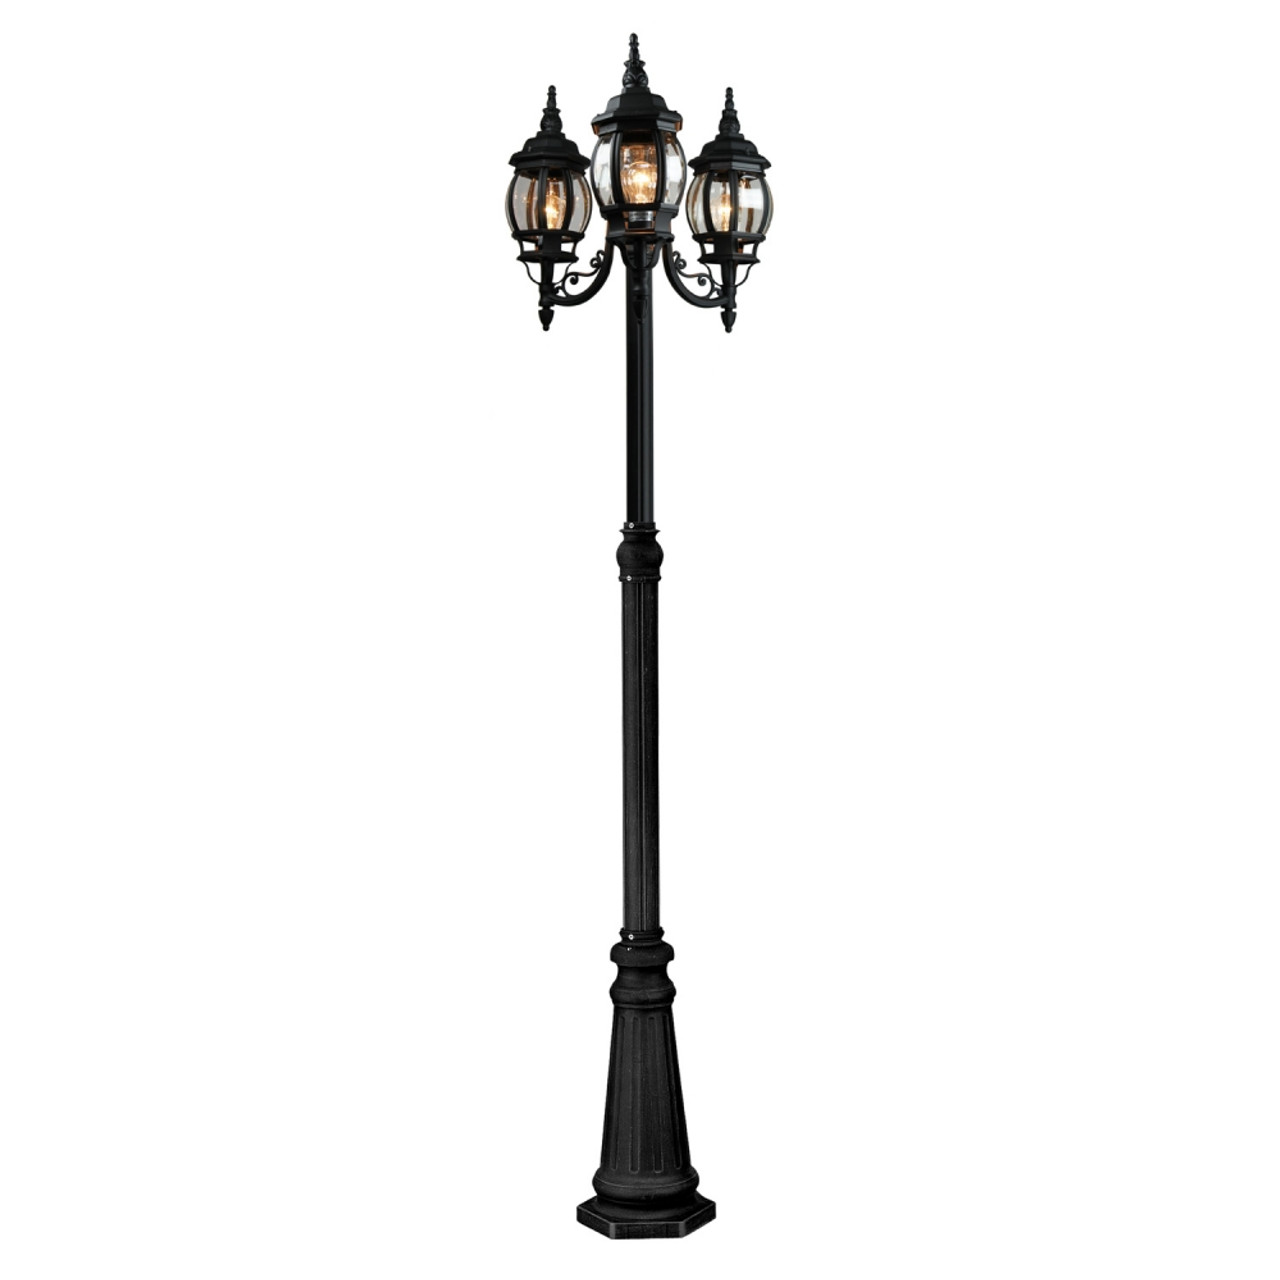 Classico Three Light Post Lantern by Artcraft Lighting, Black Finish with Clear Glass, 120V, 100 W each bulb, UL Listed (AC8099BK)